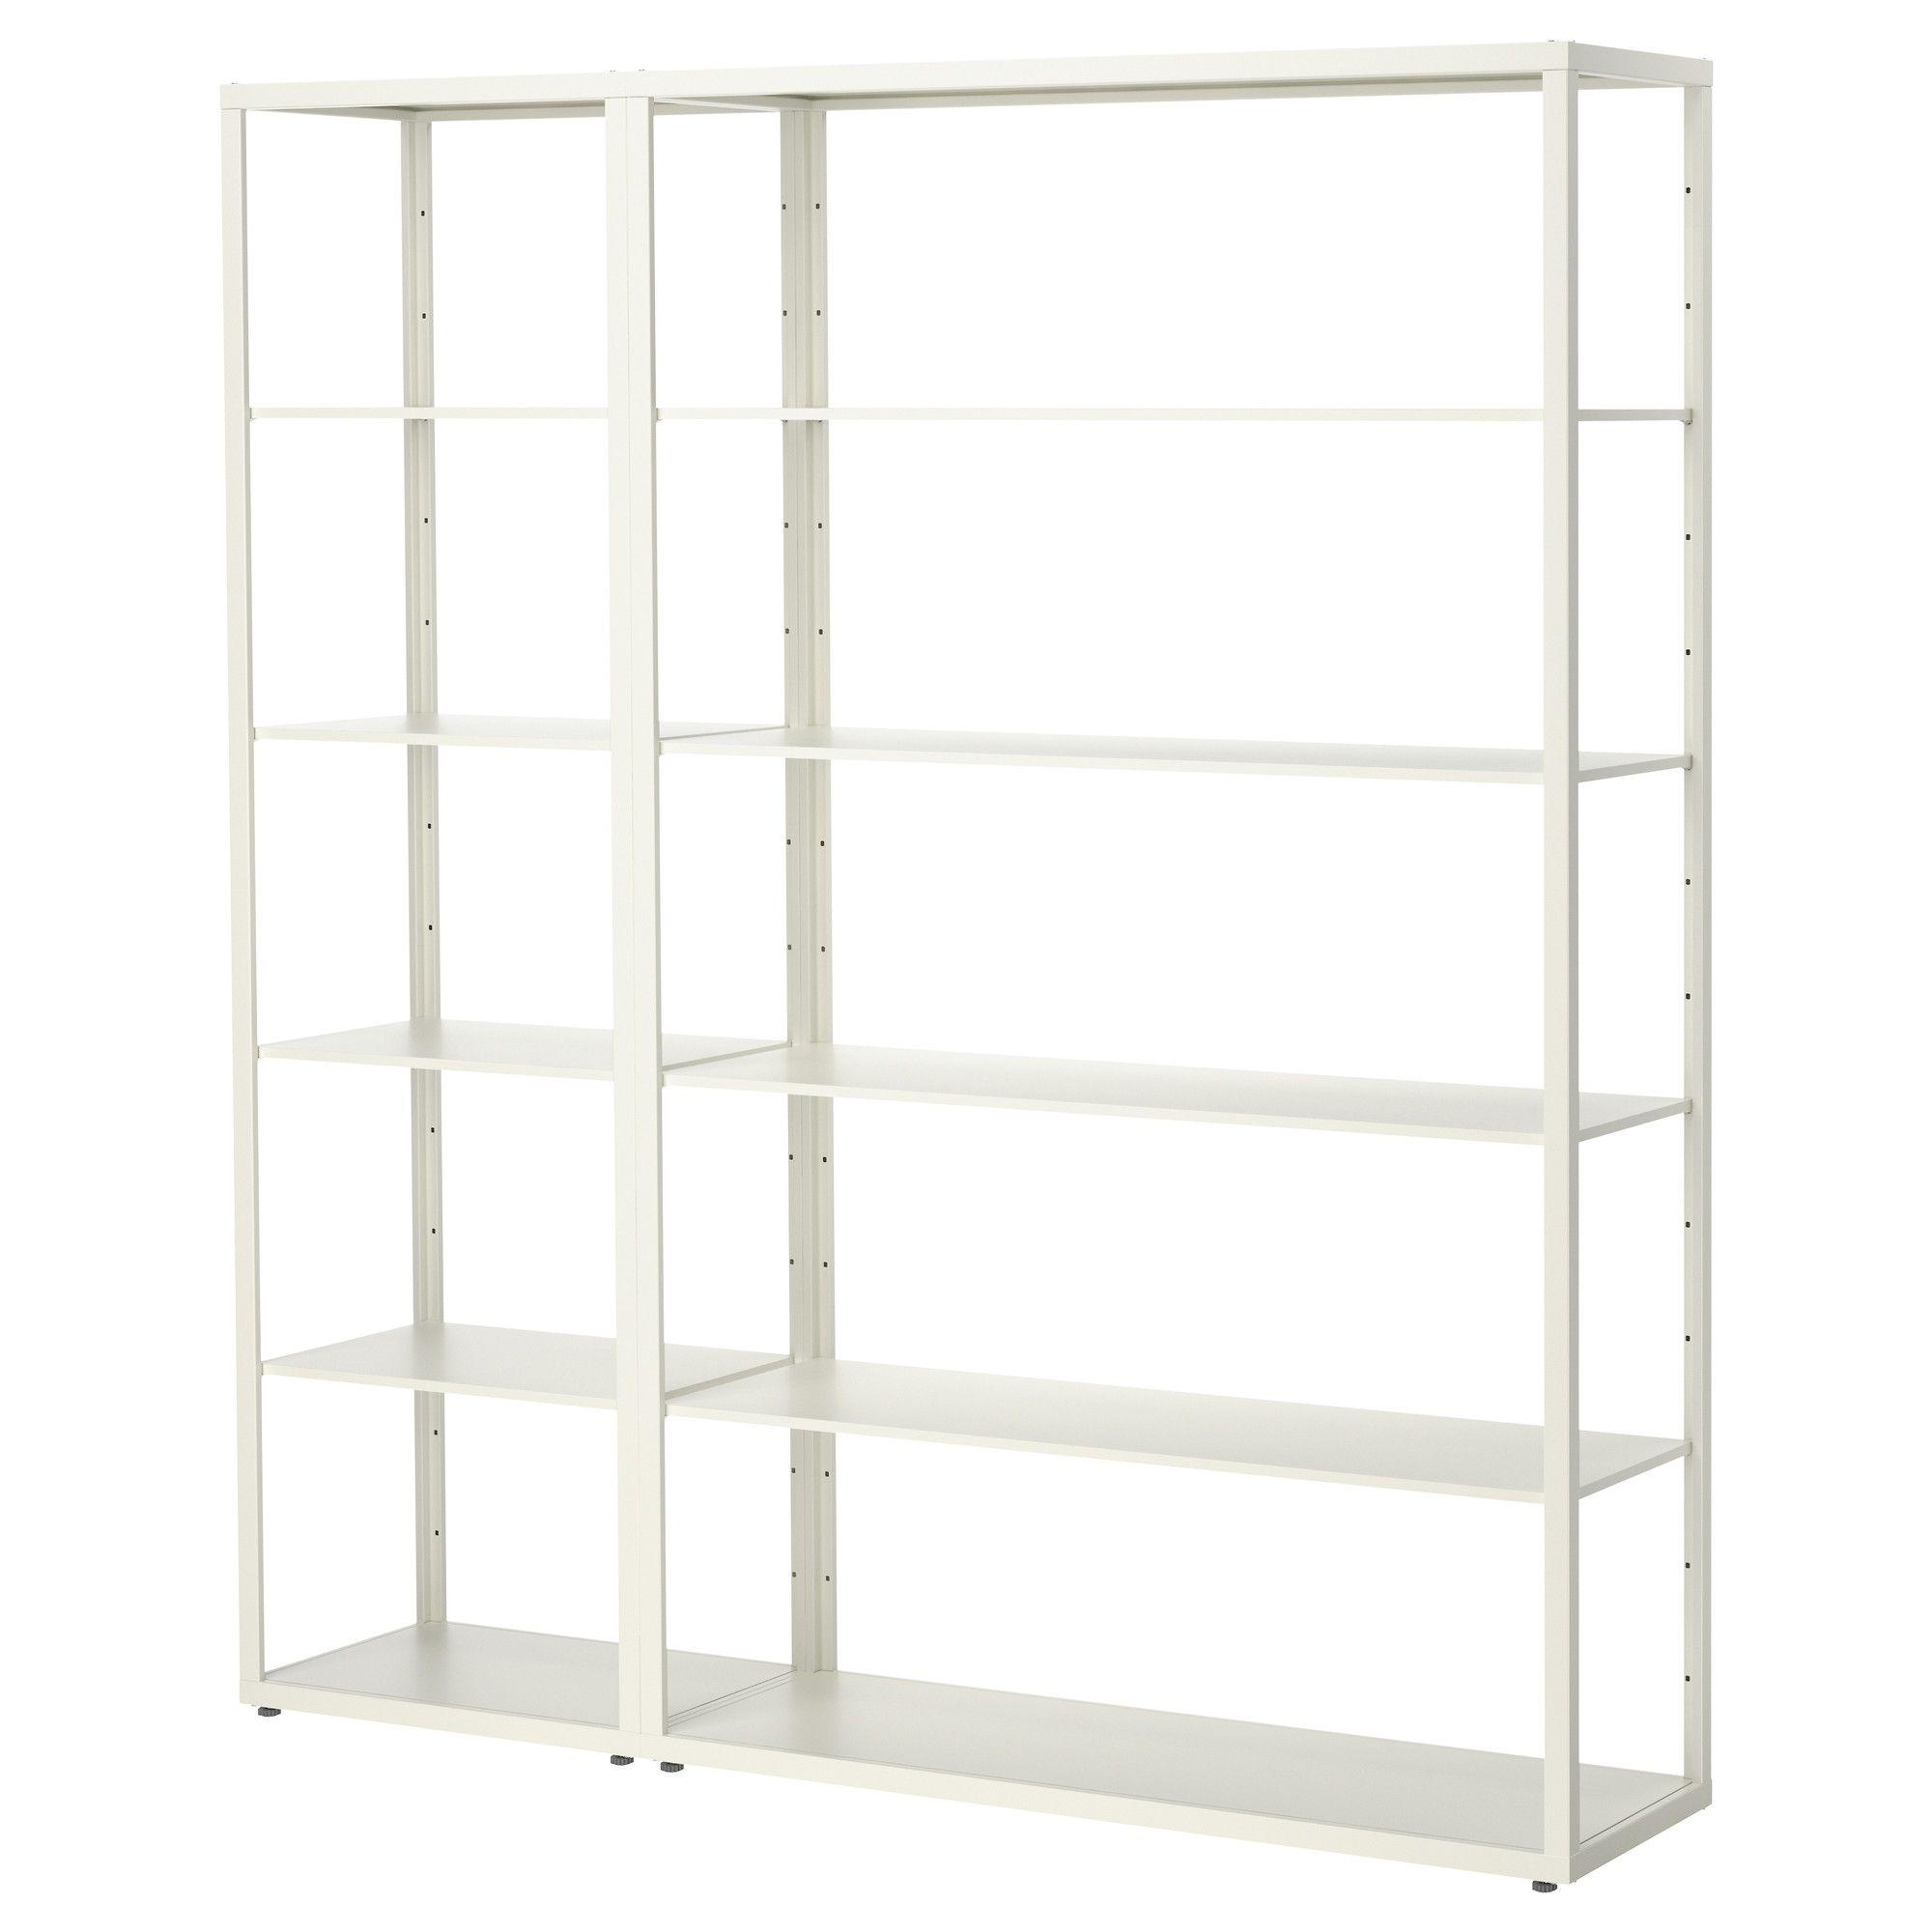 Ikea Us Furniture And Home Furnishings Shelving Shelving Unit